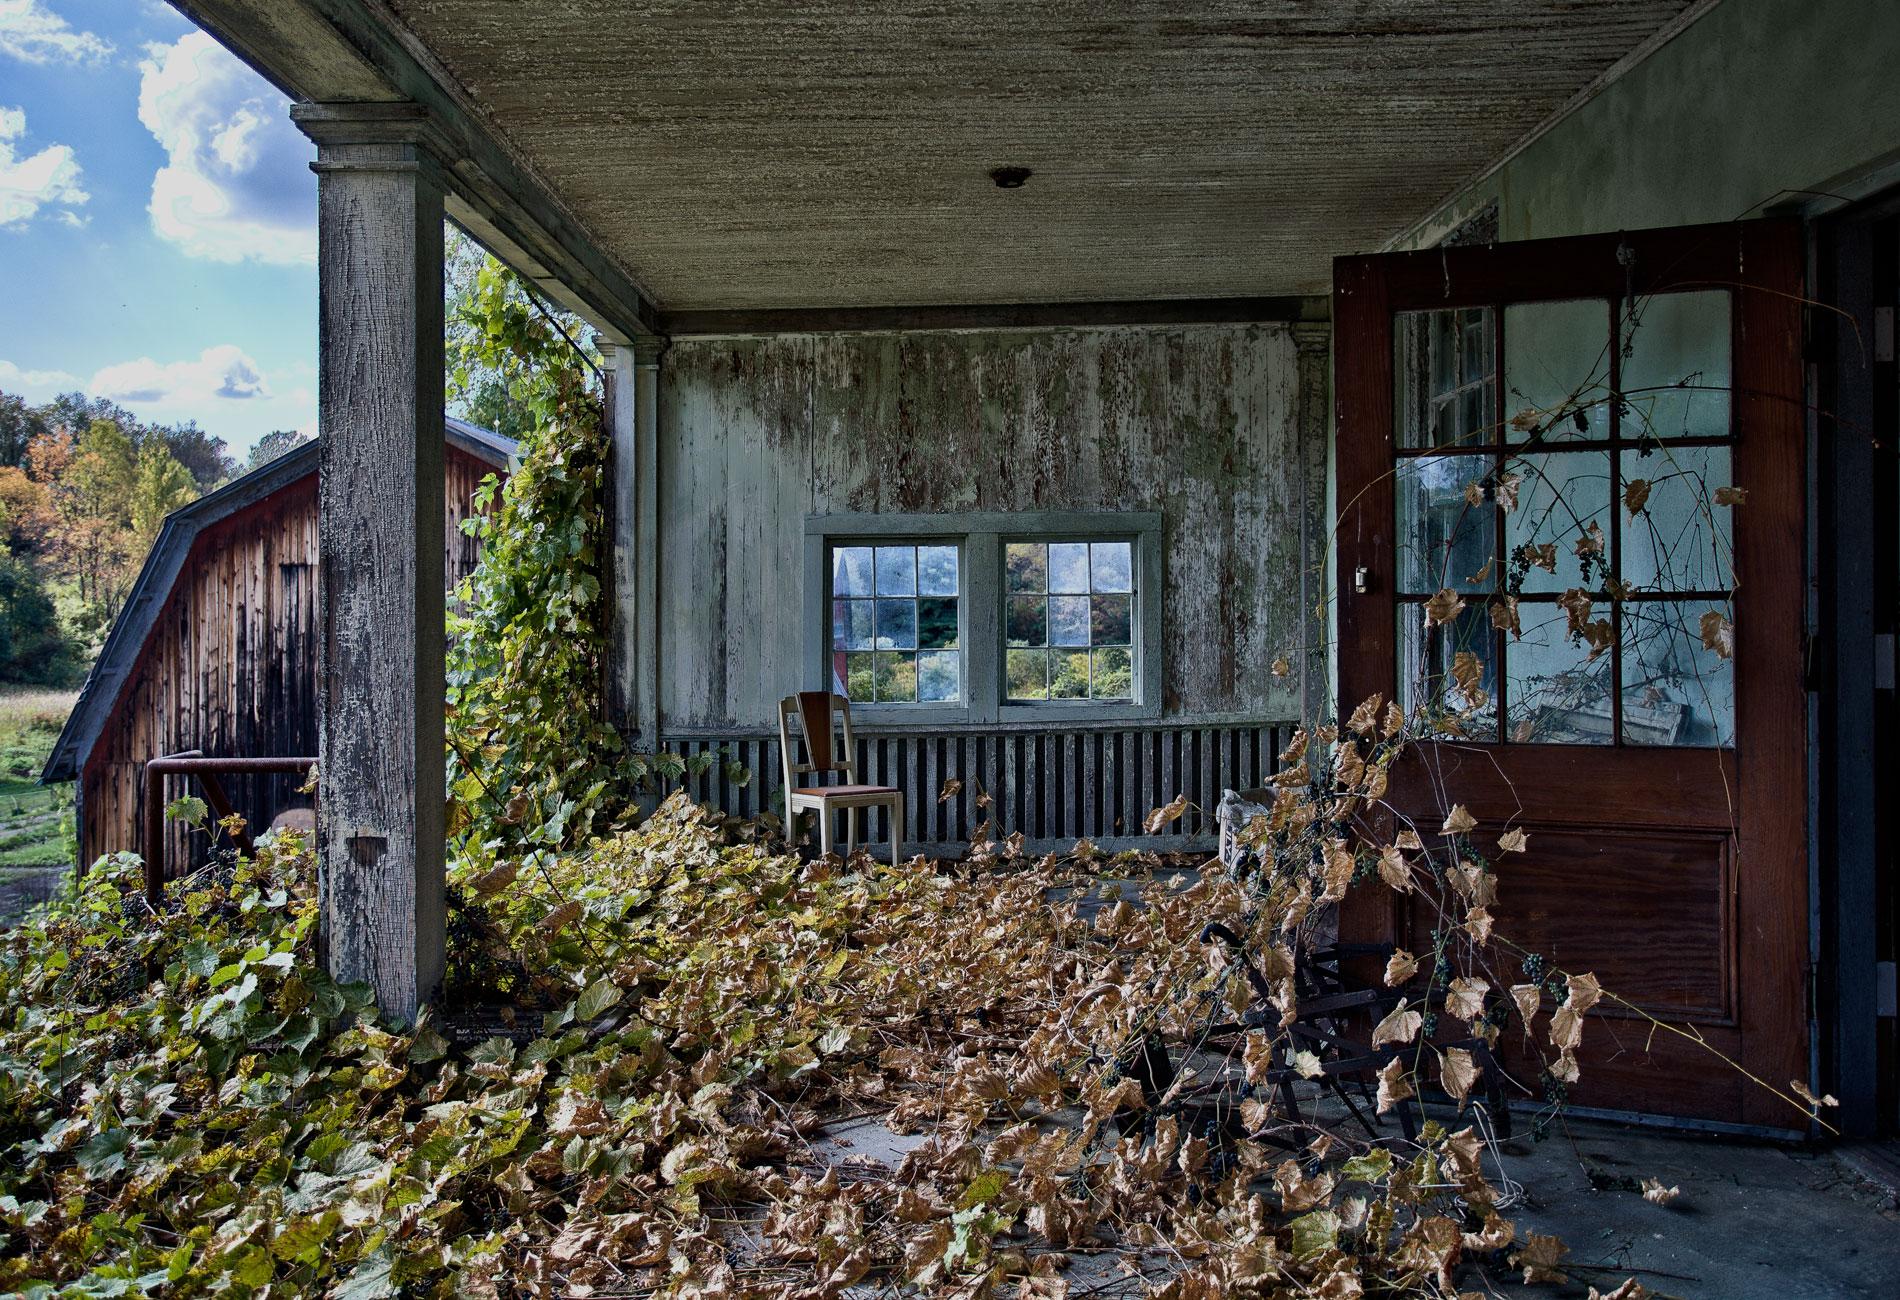 Section 8 Housing Alias Darren Ketchum